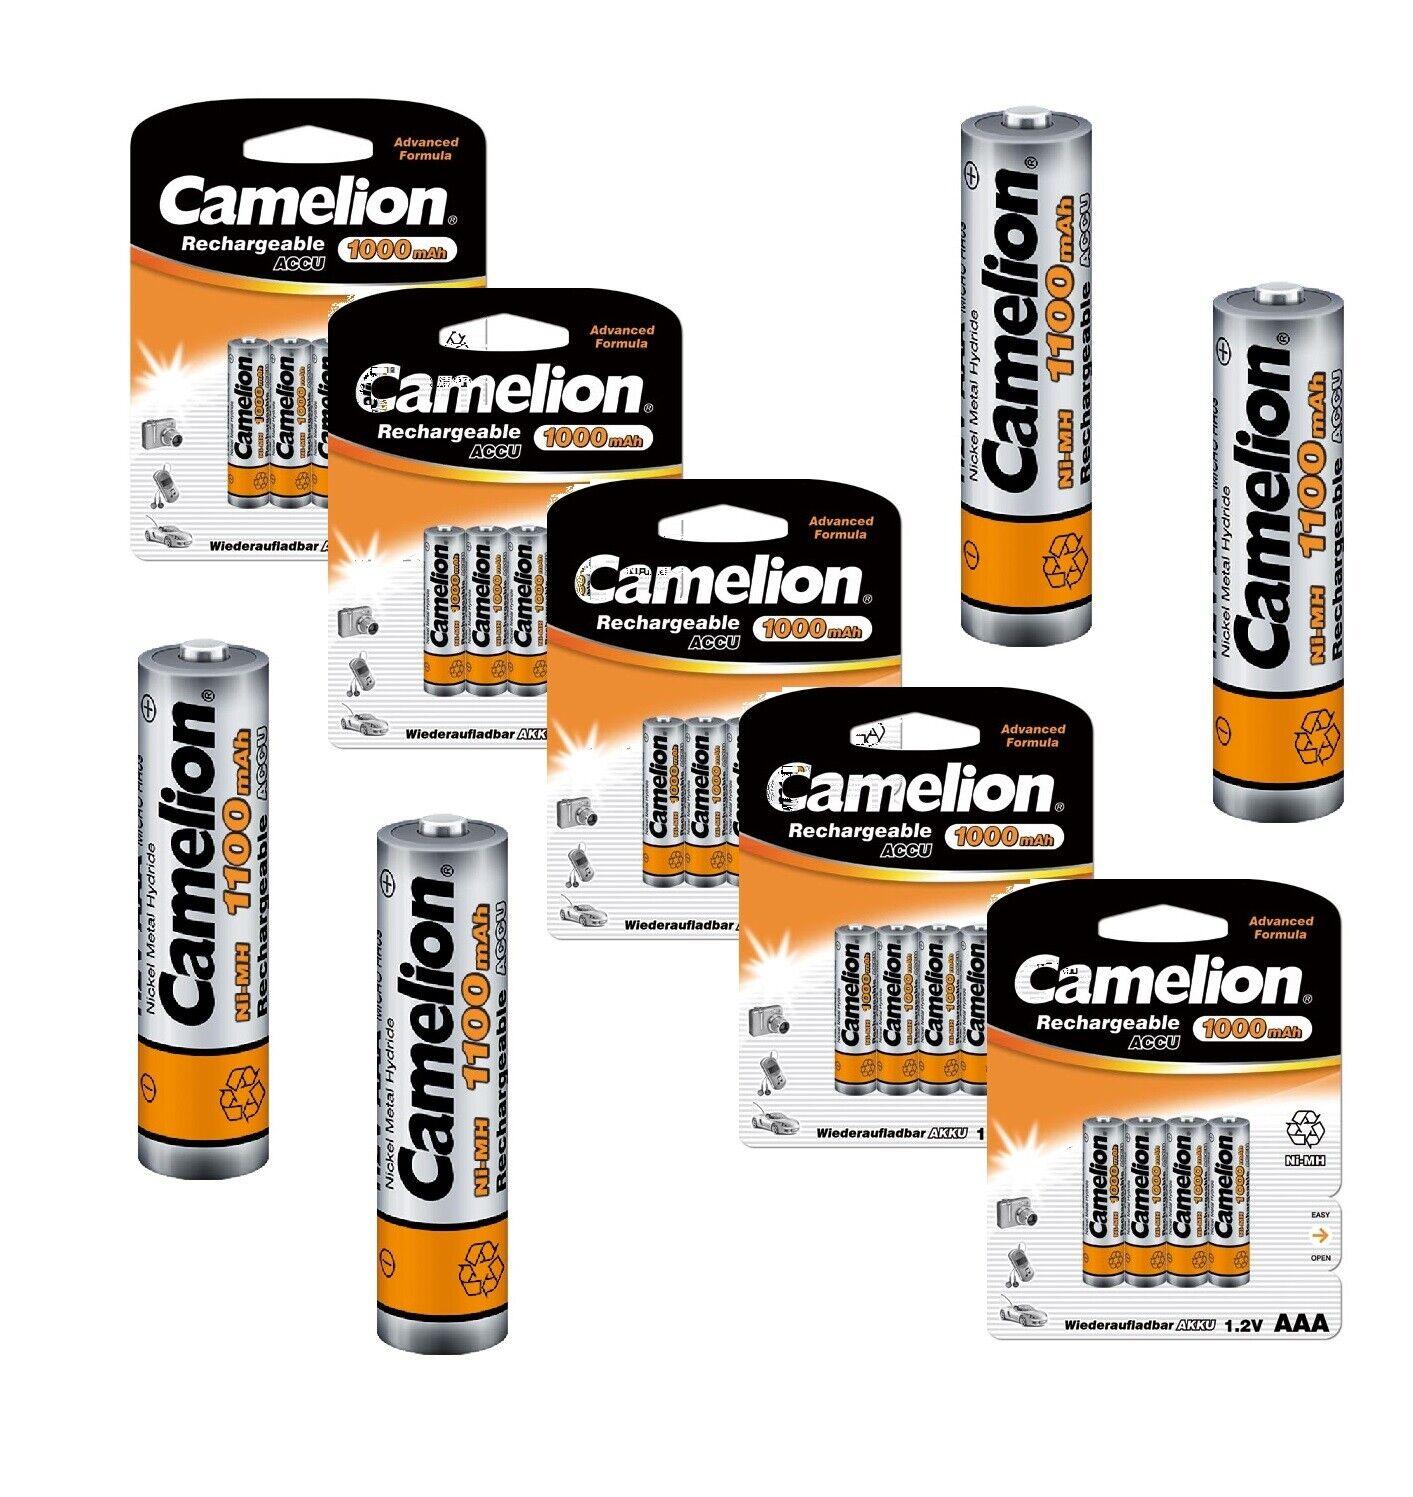 Camelion 1100 mAh AAA Micro Akkus NiMH wiederaufladbare Batterien für zb Telefon